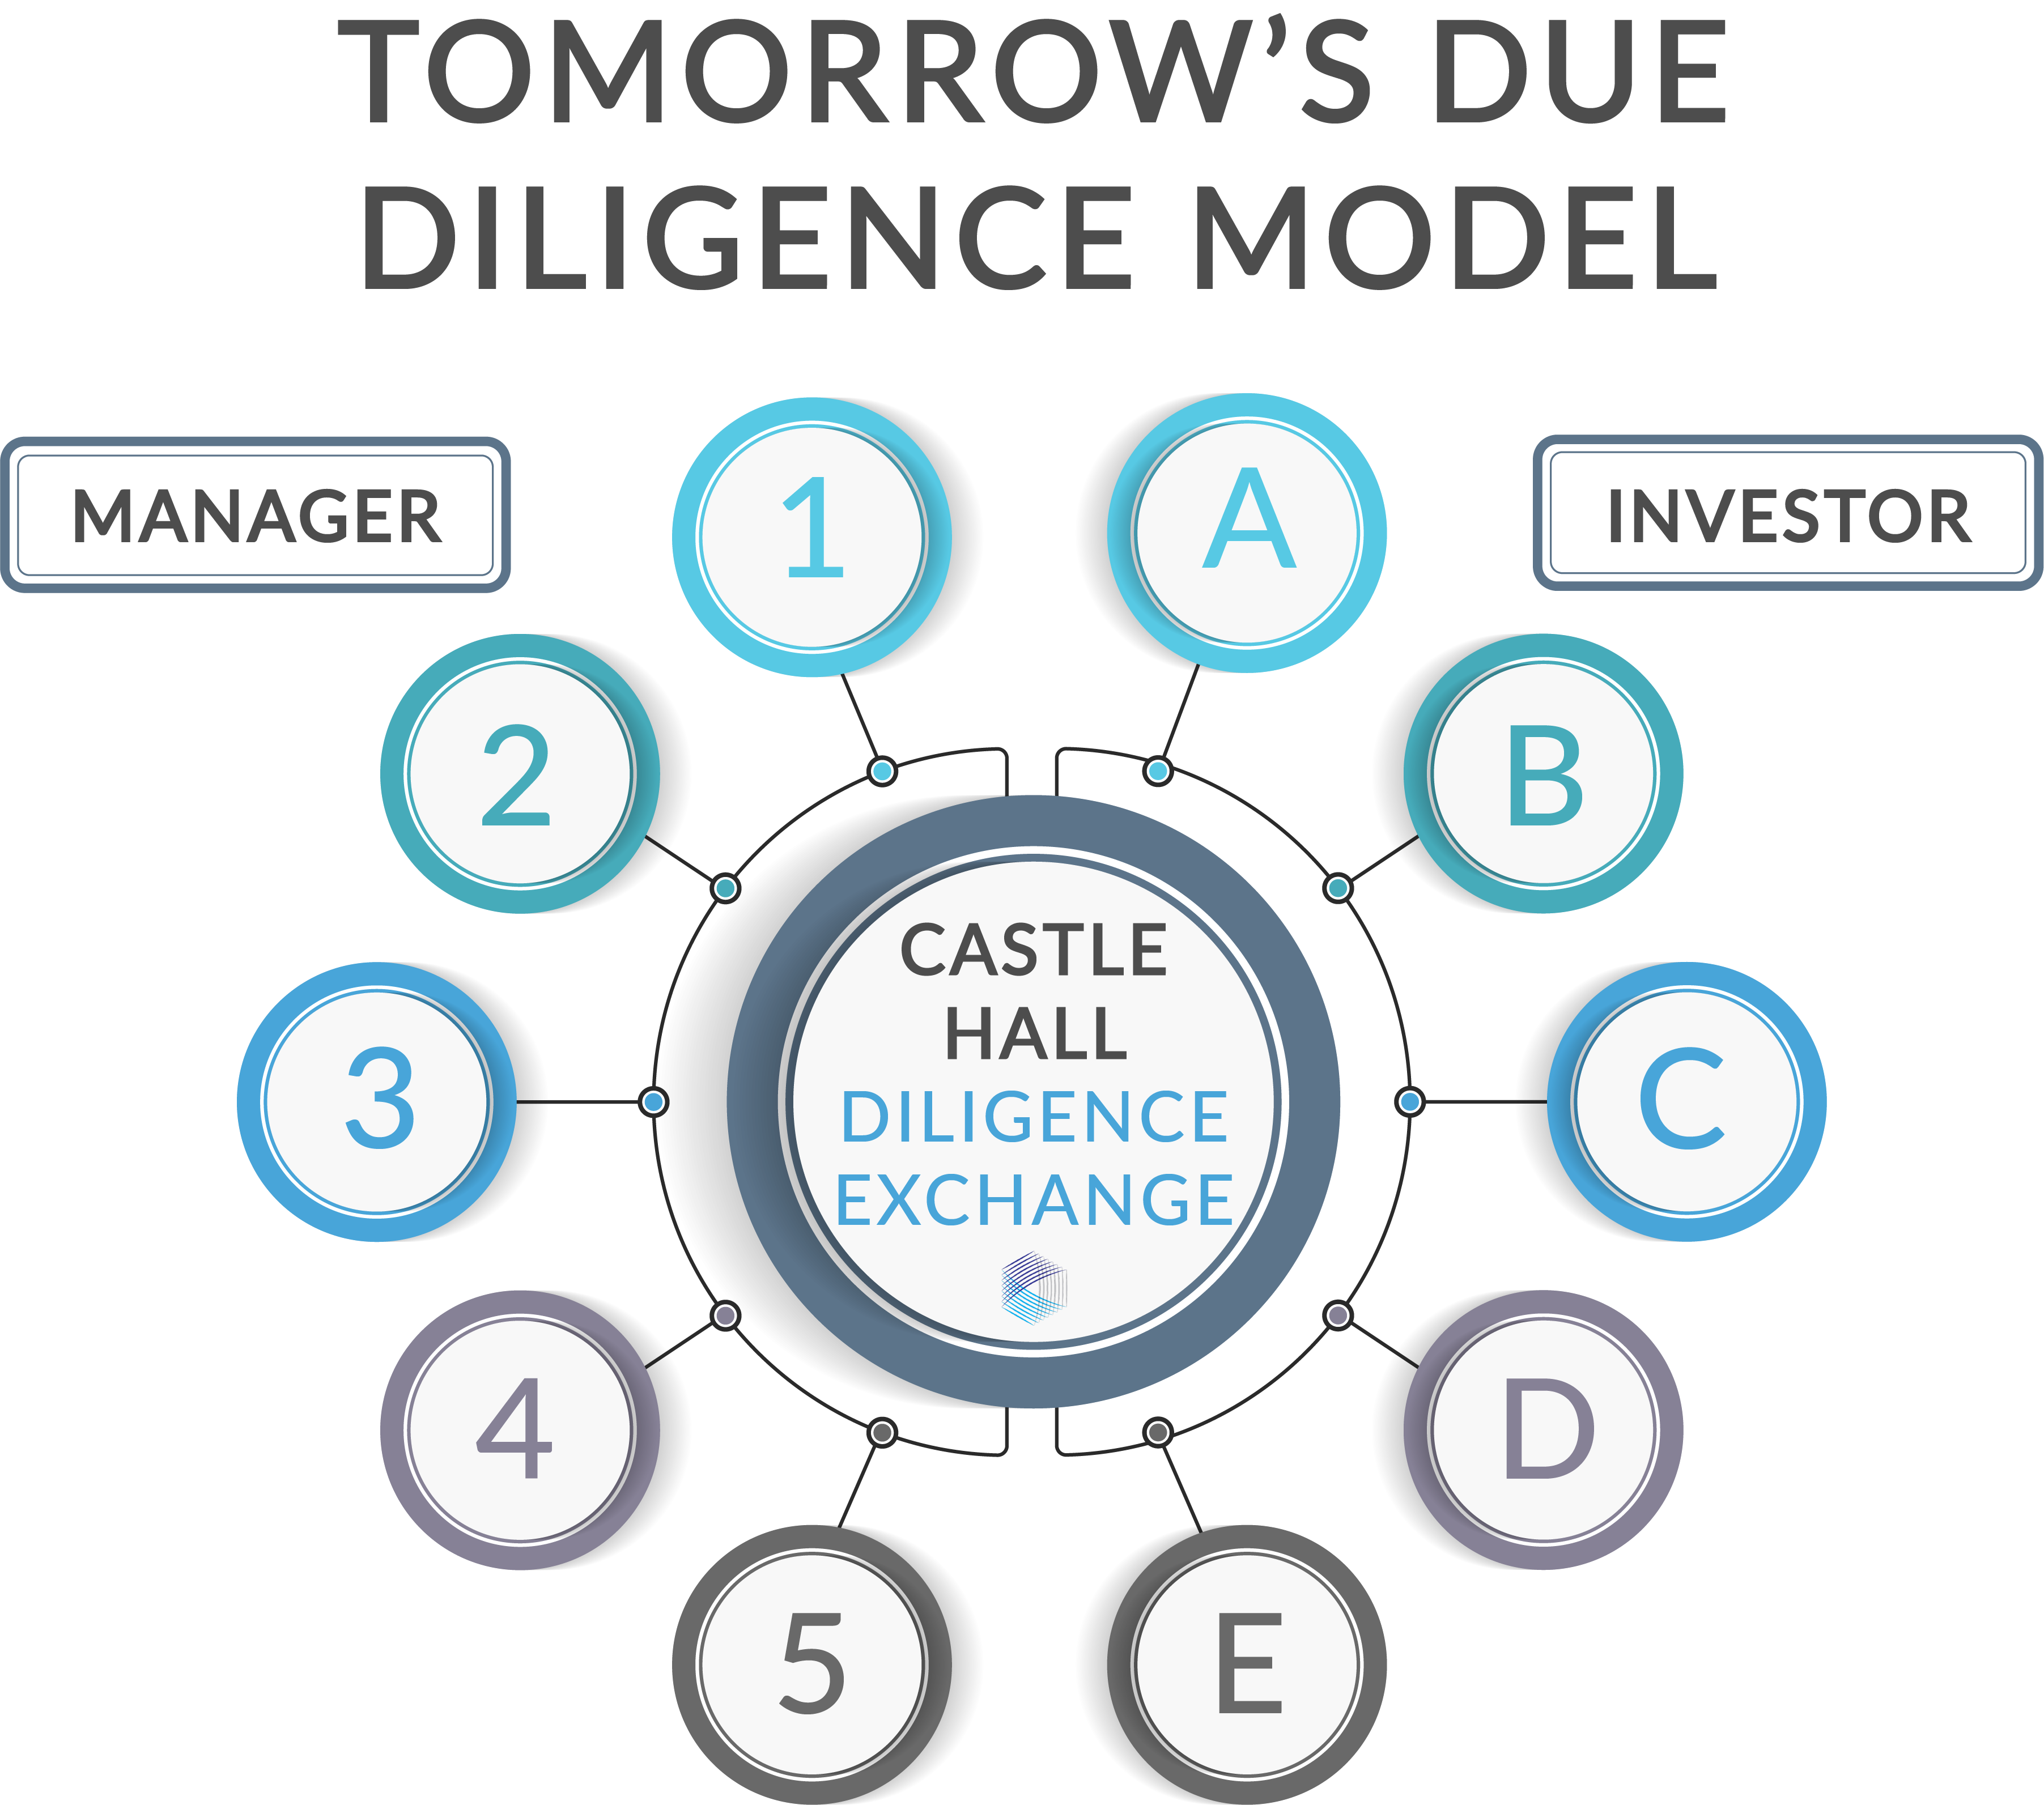 201902 DiligenceExchange Infographic-1